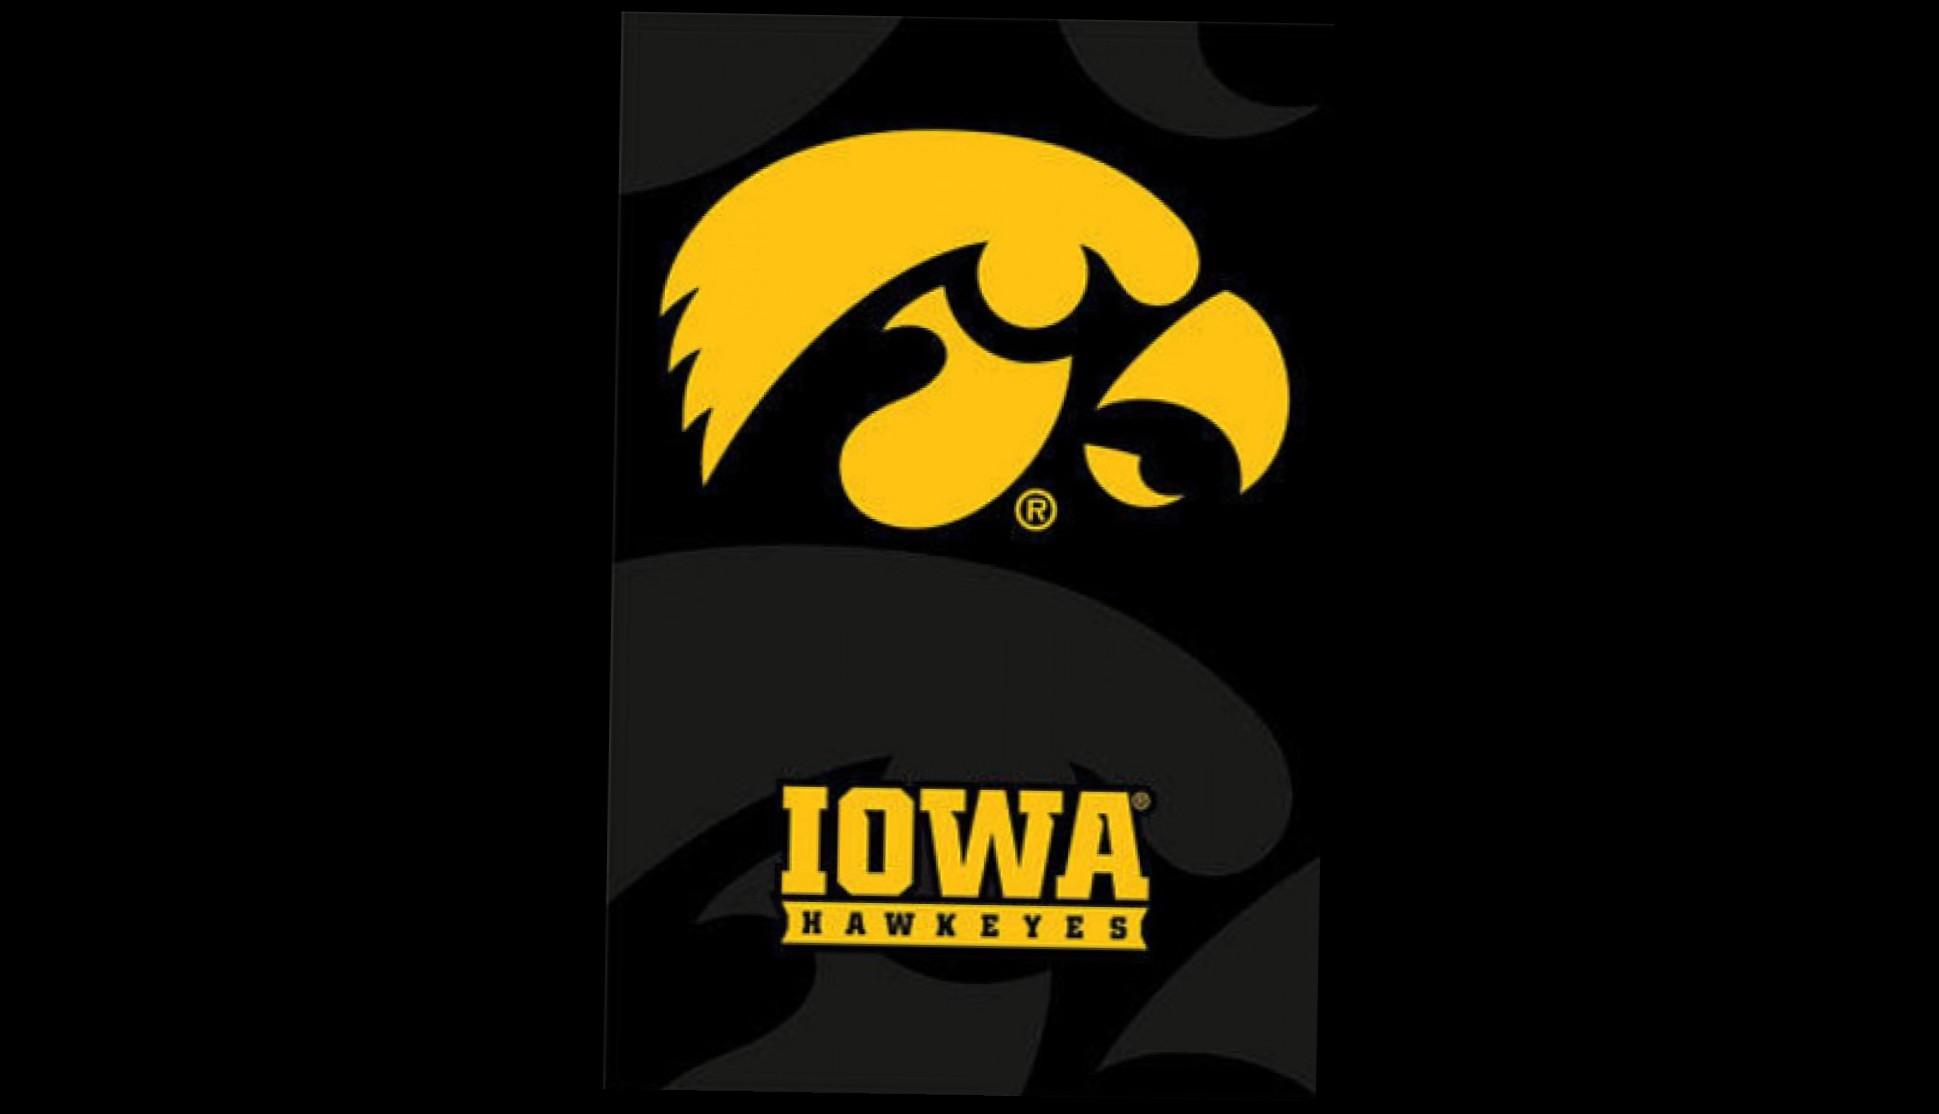 iowa hawkeye football wallpaper – 6 items